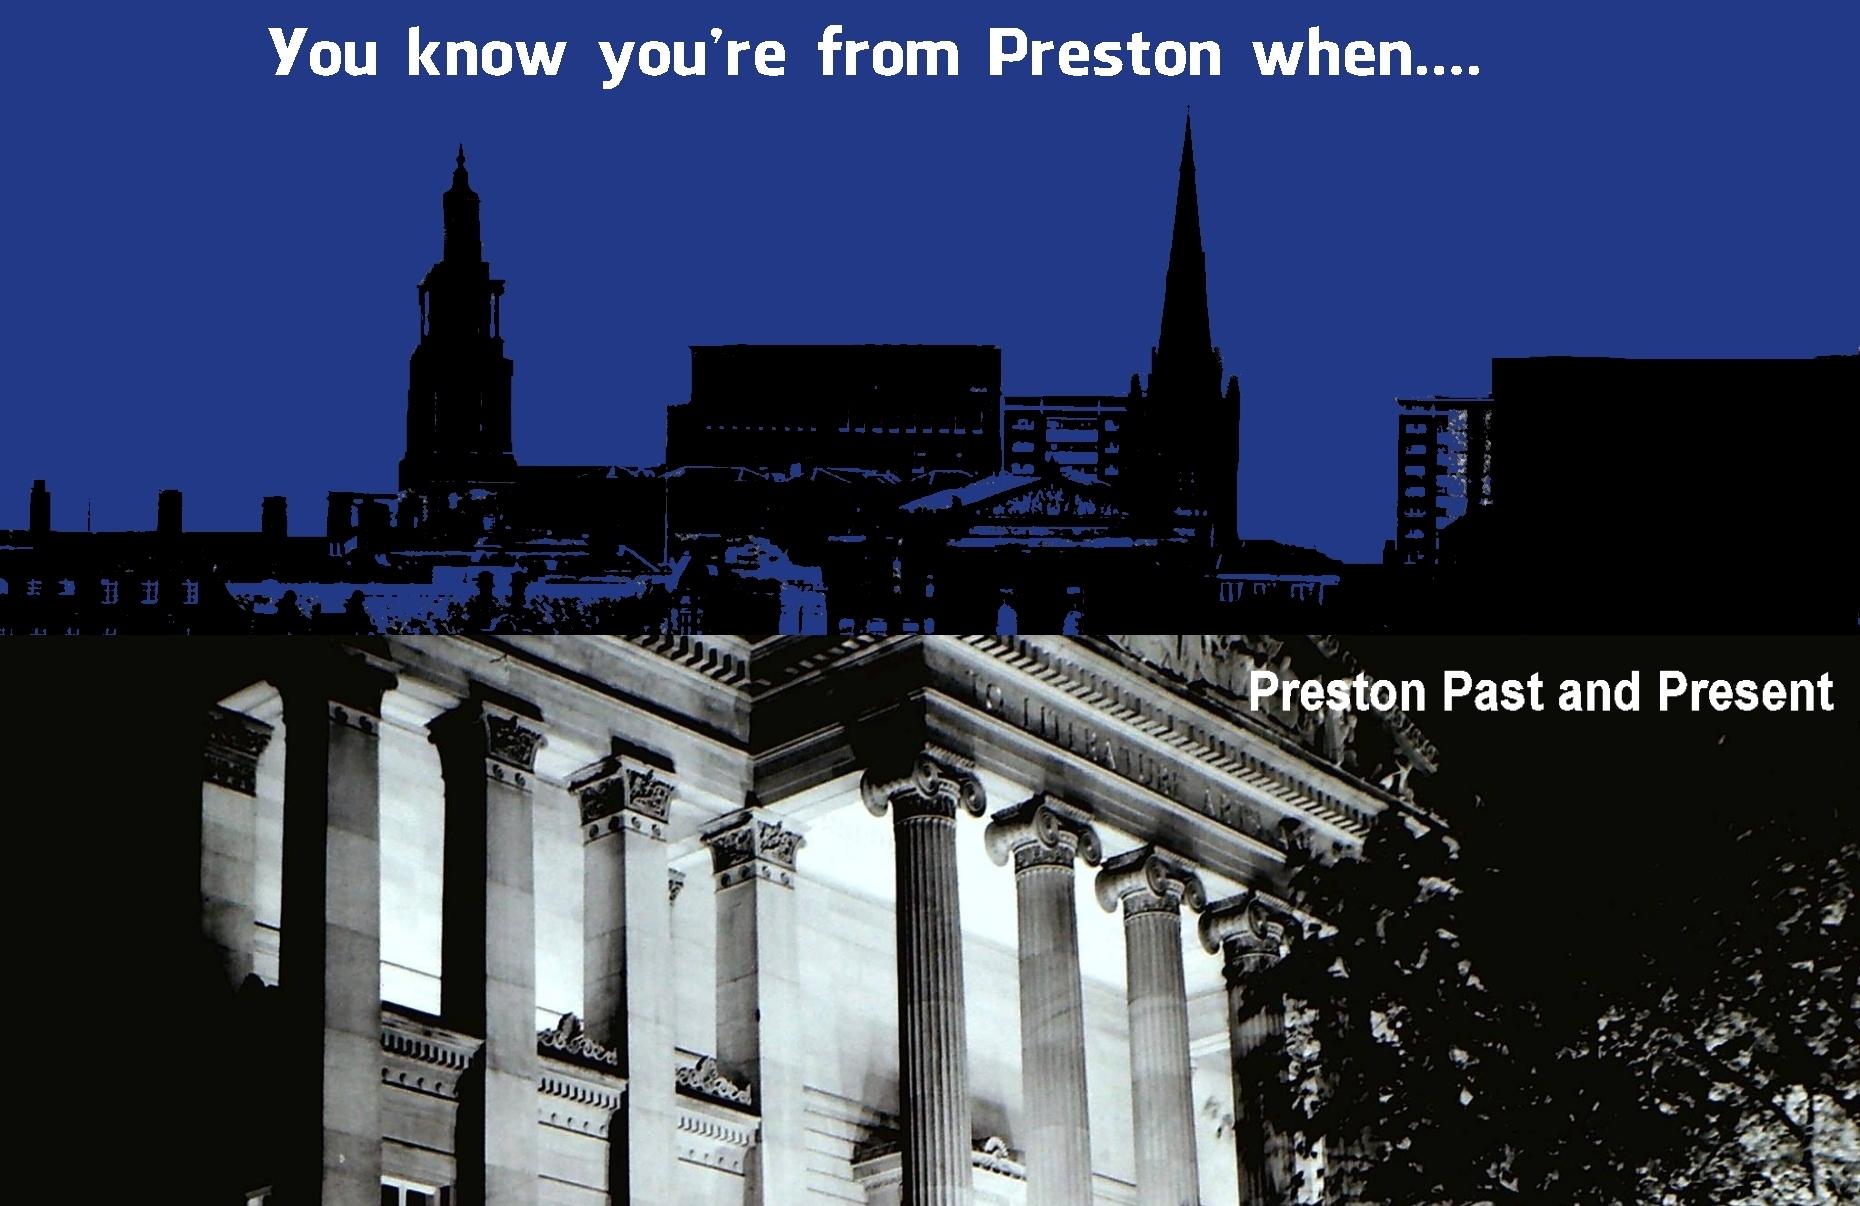 Preston Facebook Groups covers